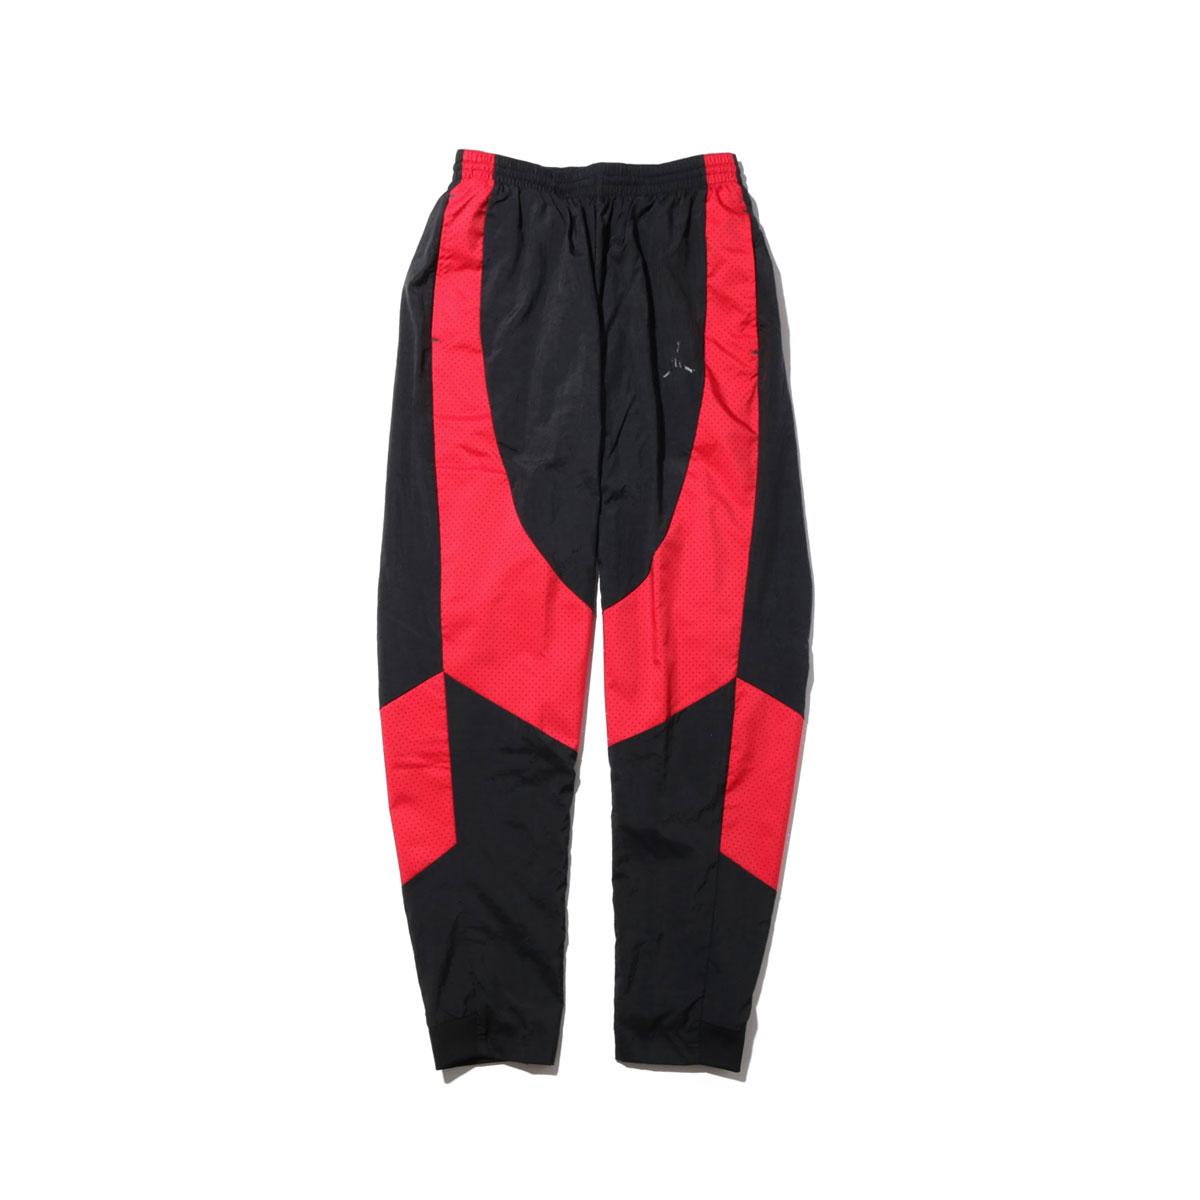 NIKE JSW WINGS MUSCLE PANT(ナイキ ジョーダン JSW WINGS マッスル パンツ)BLACK/GYM RED/(BLACK)【メンズ ナイロンパンツ】17HO-S